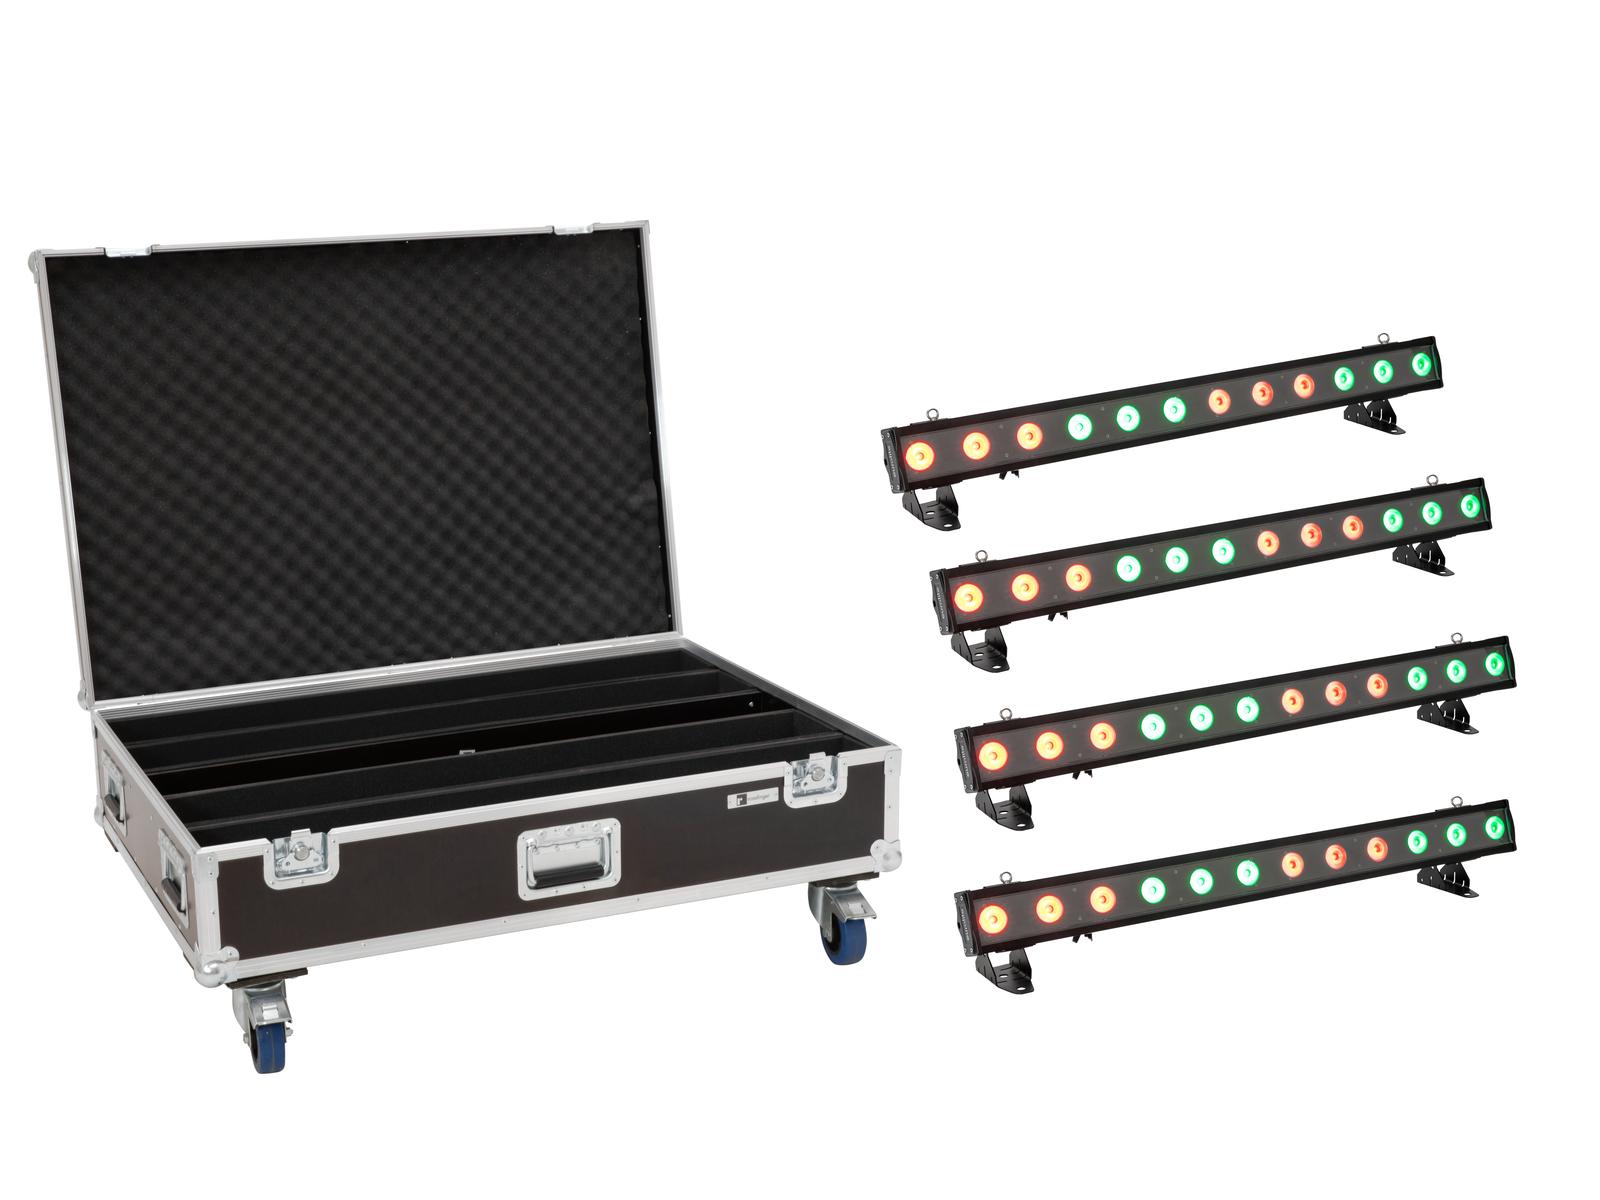 EUROLITE Set 4x LED IP T-PIX 12 HCL Leiste + Case mit Rollen